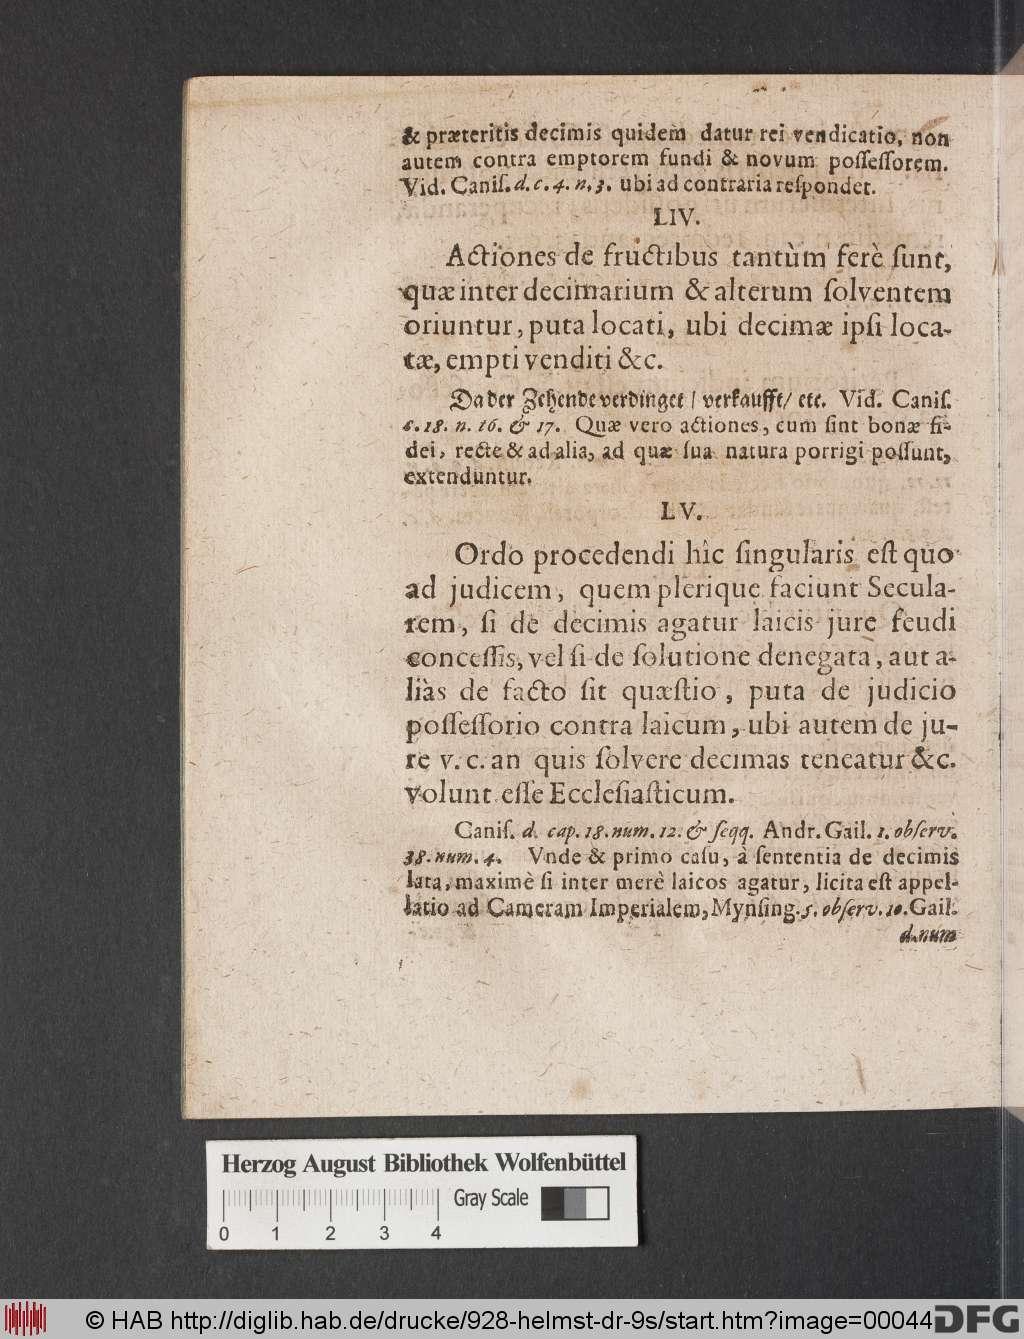 http://diglib.hab.de/drucke/928-helmst-dr-9s/00044.jpg